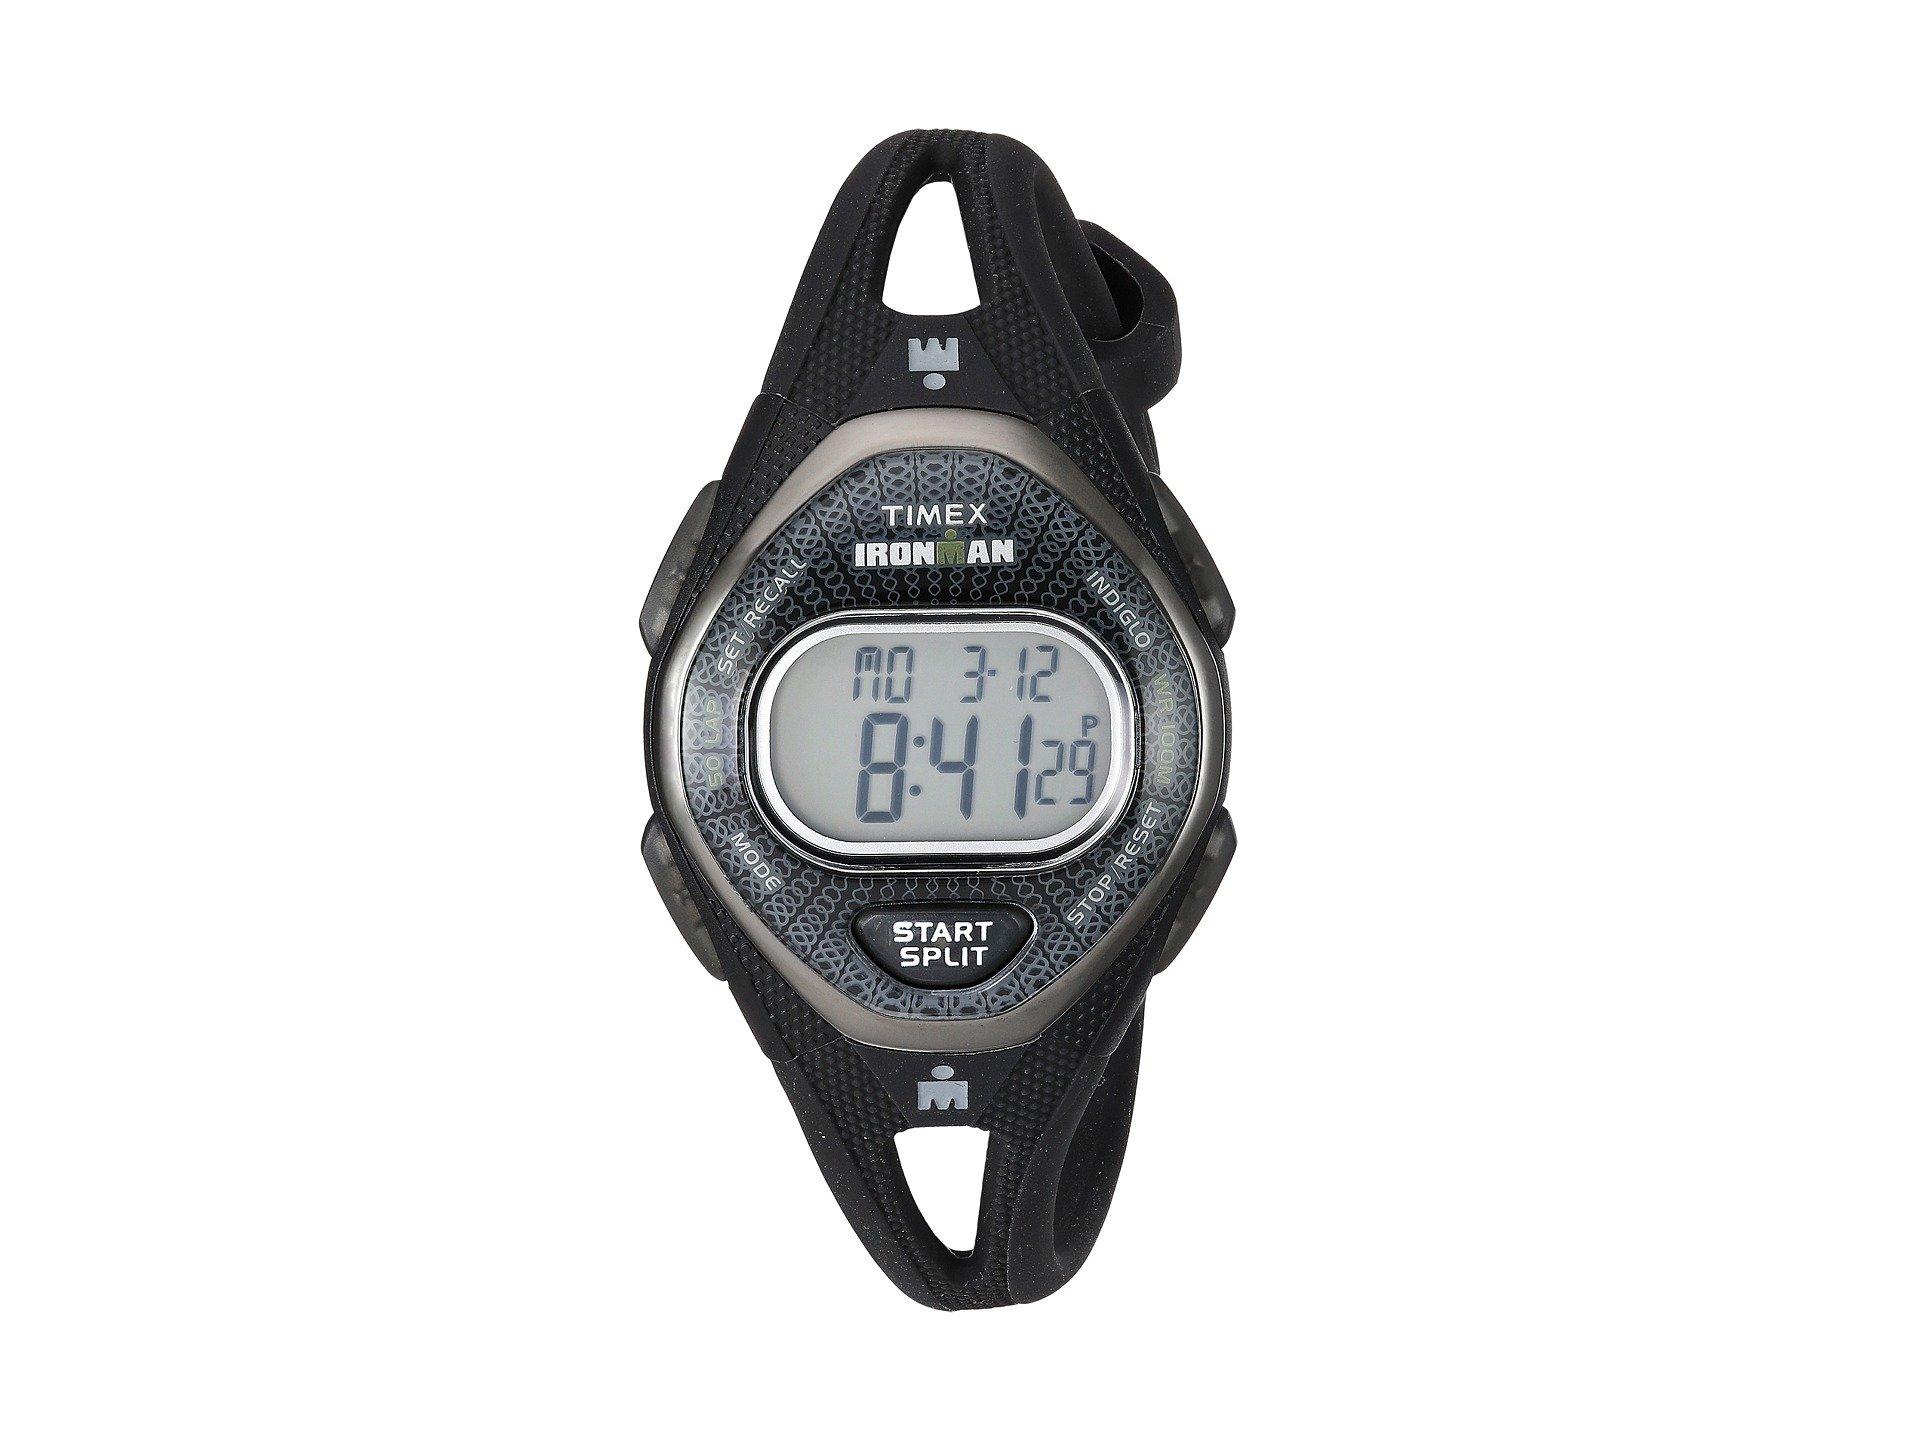 Reloj para Mujer Timex Ironman Sleek 50 Mid-Size Silicone Strap  + Timex en VeoyCompro.net